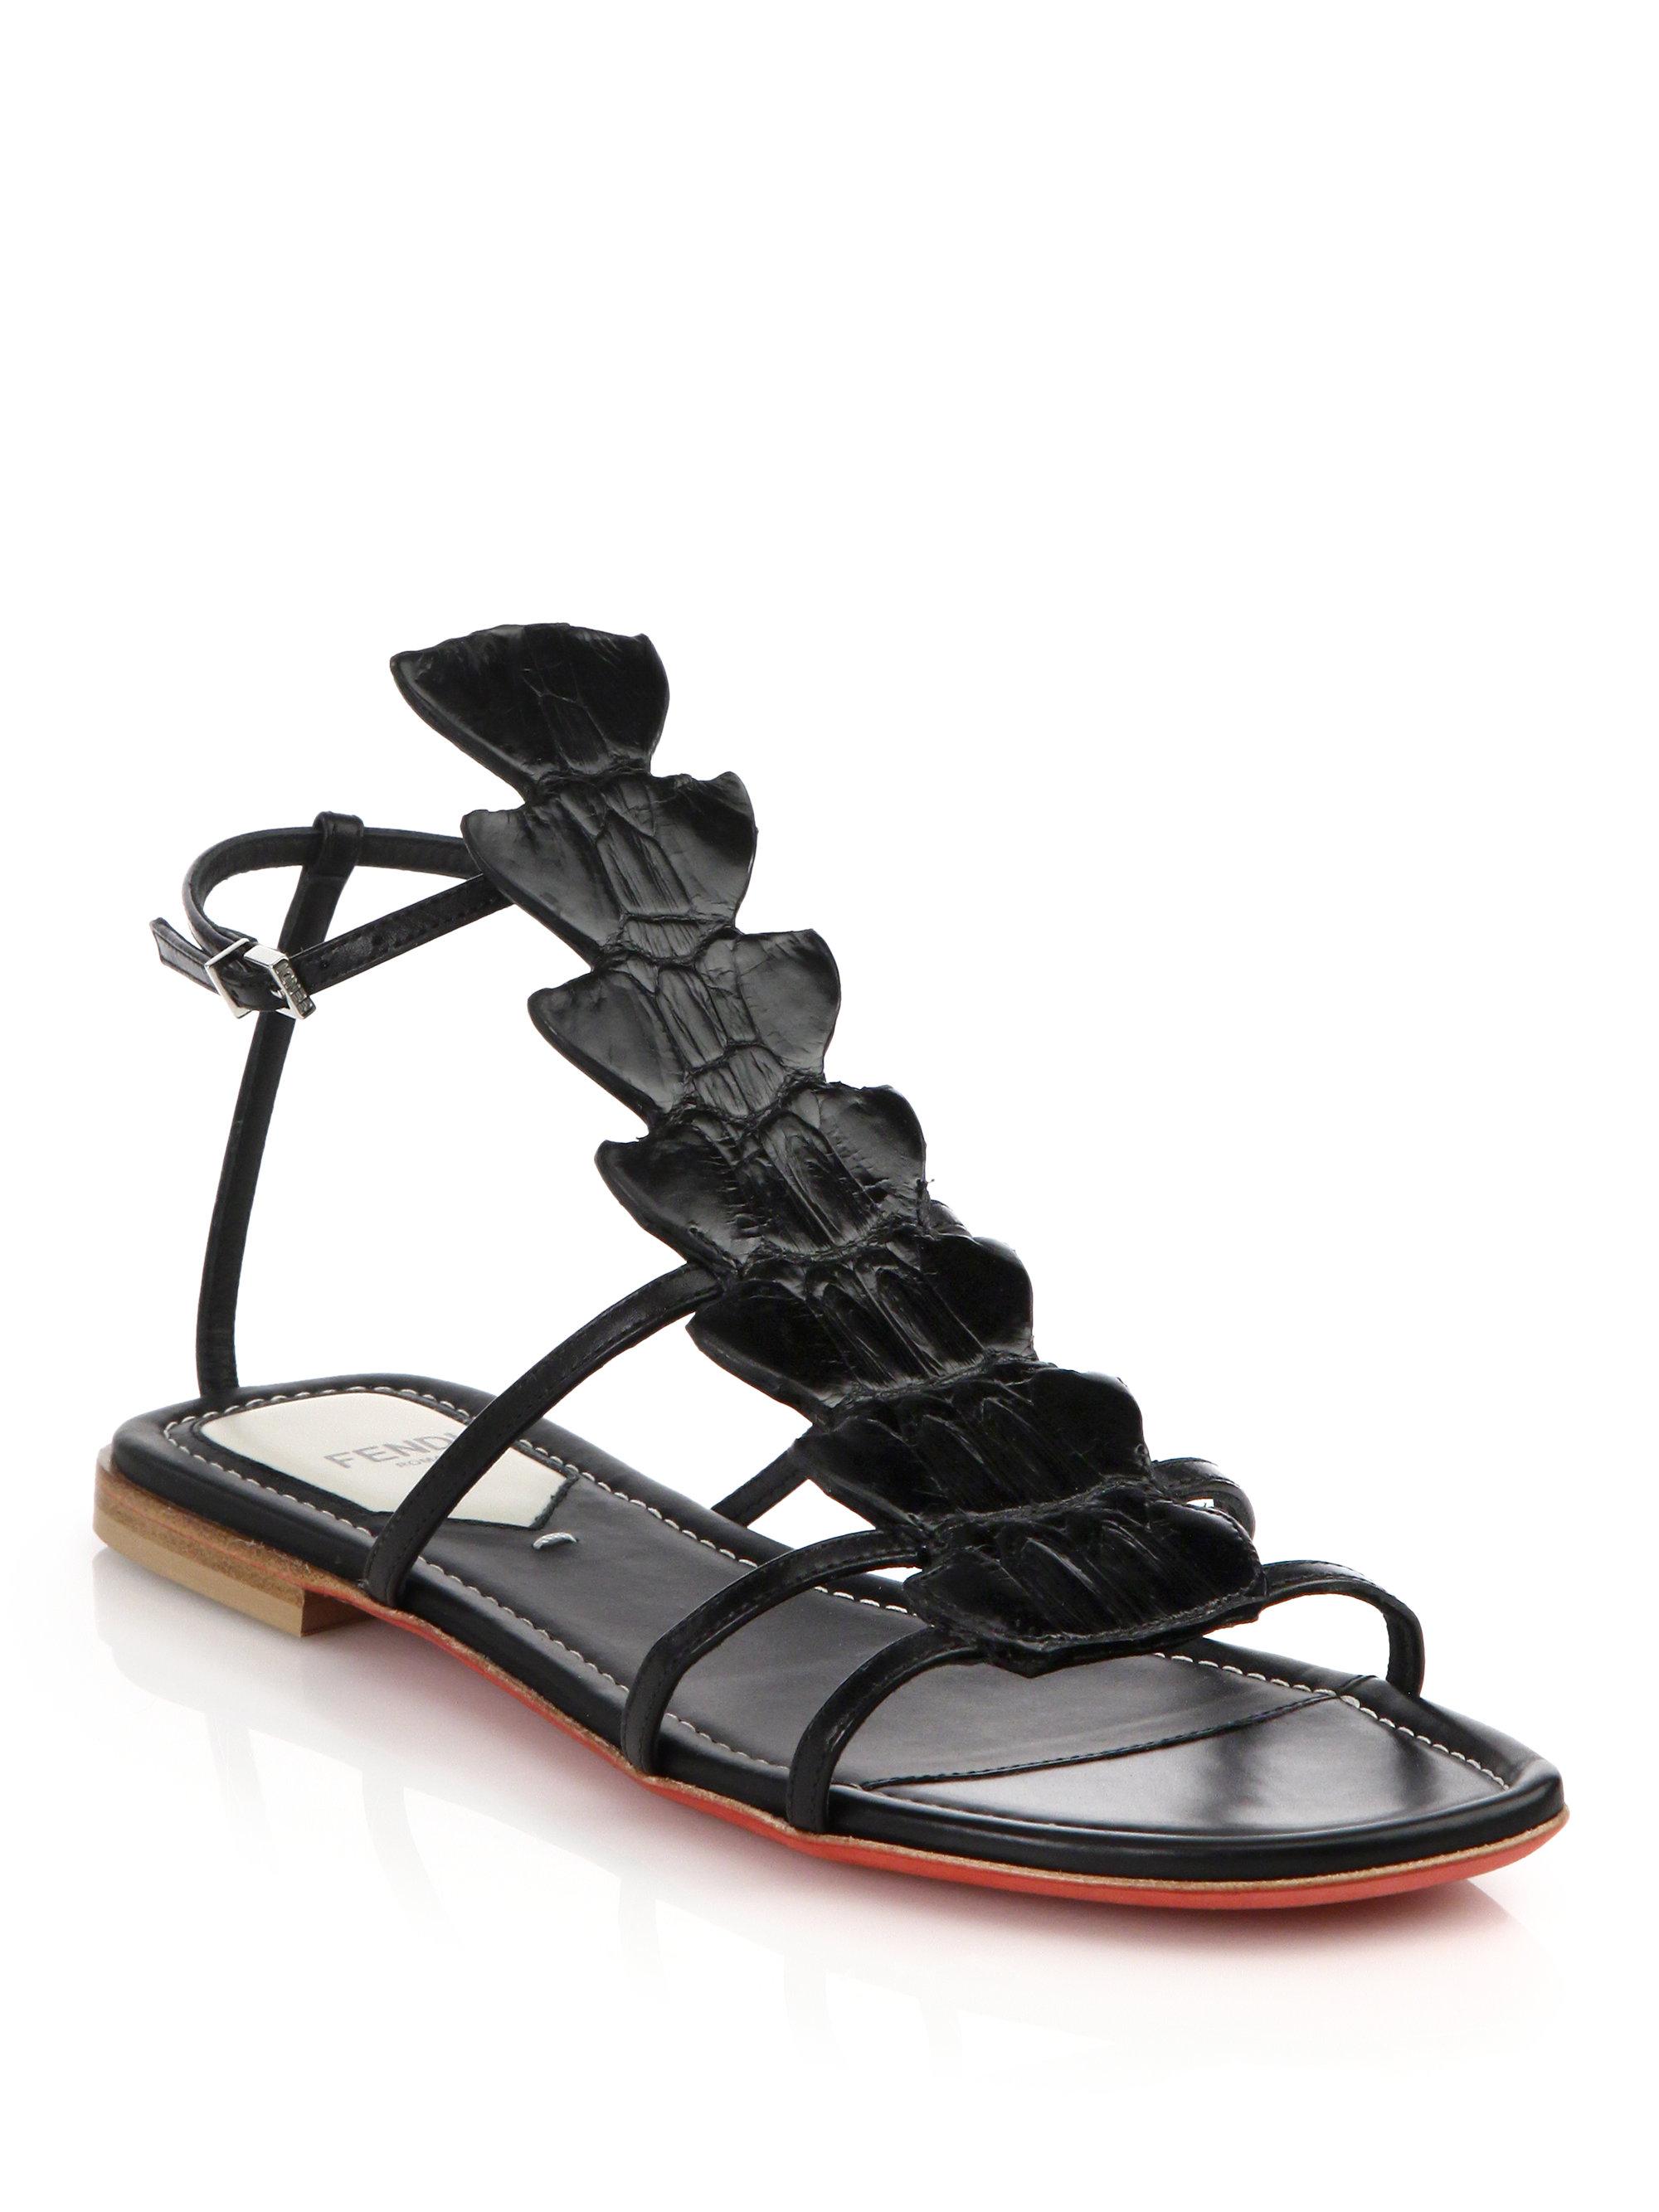 c1f6ce935dd91 Lyst - Fendi Ava Crocodile   Leather Flat Sandals in Black